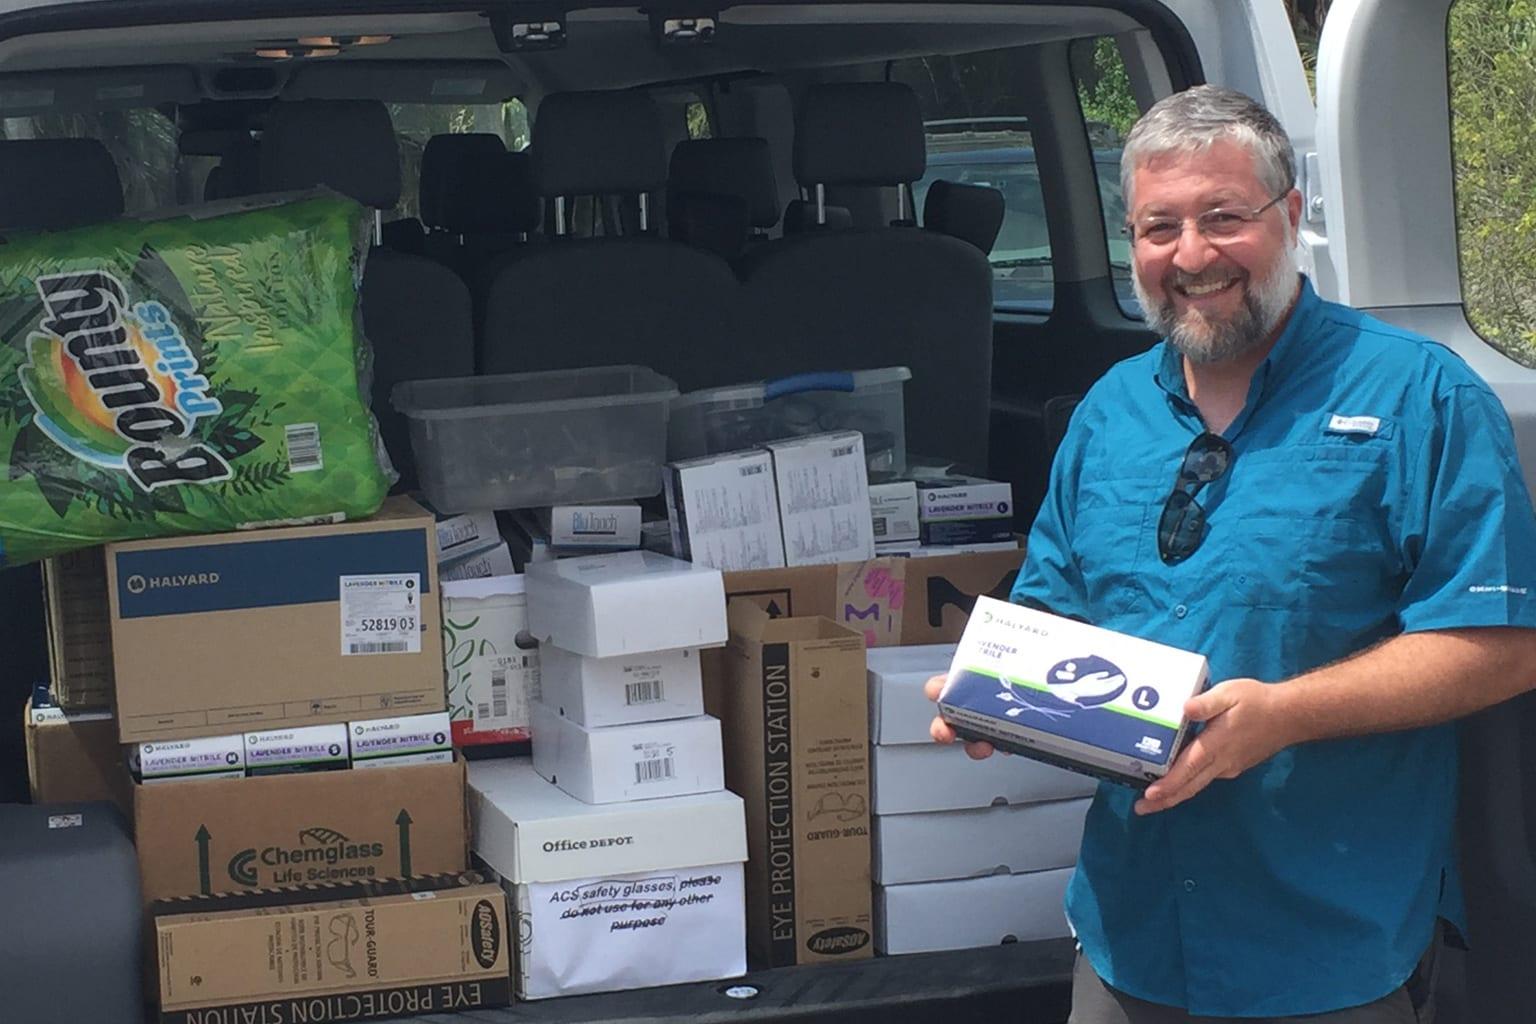 Brian Conlin loads personal protective equipment into a van